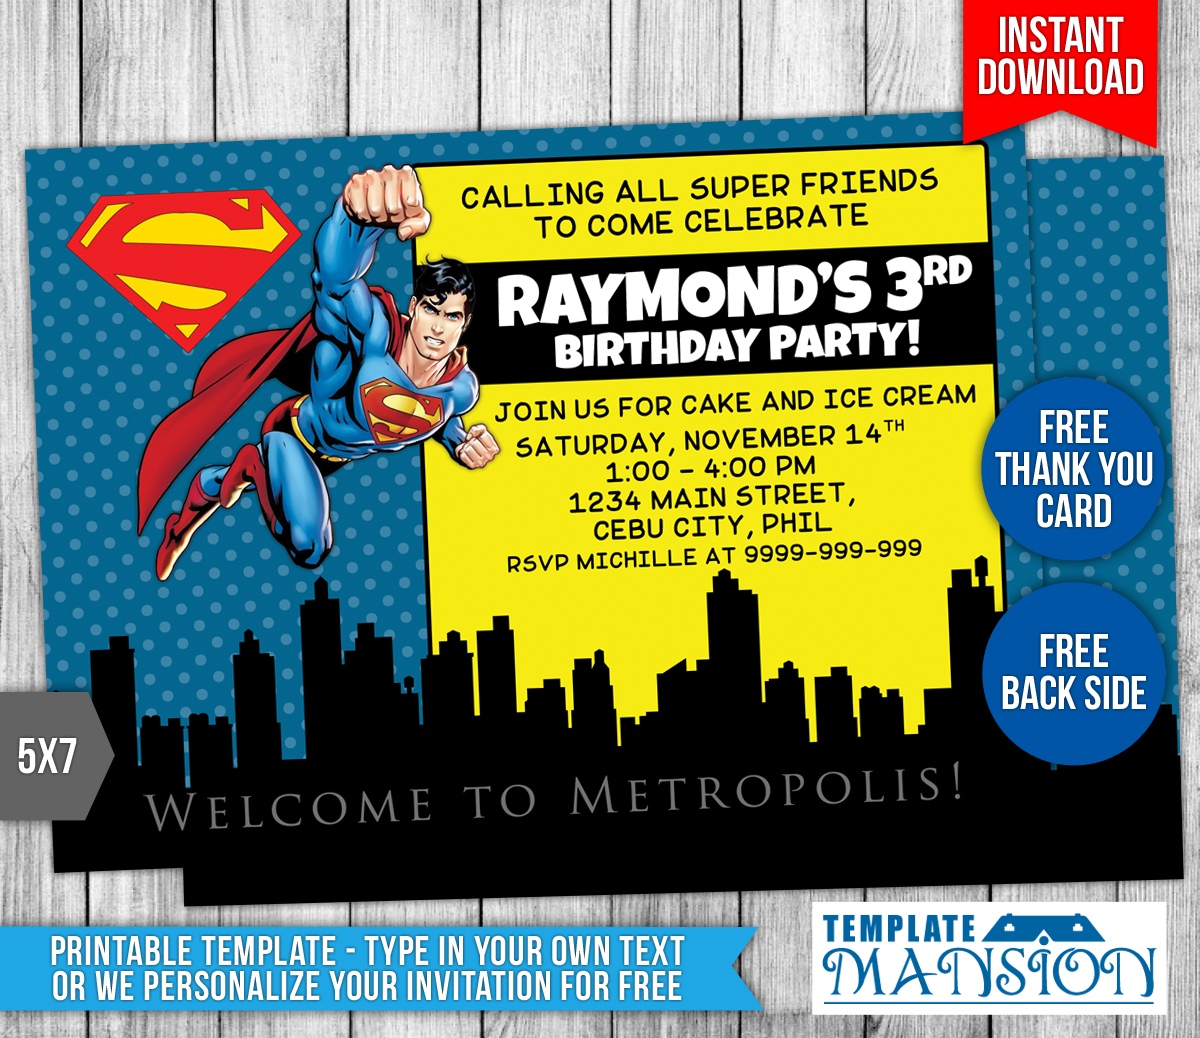 Superman Birthday Invitation Template by templatemansion on DeviantArt